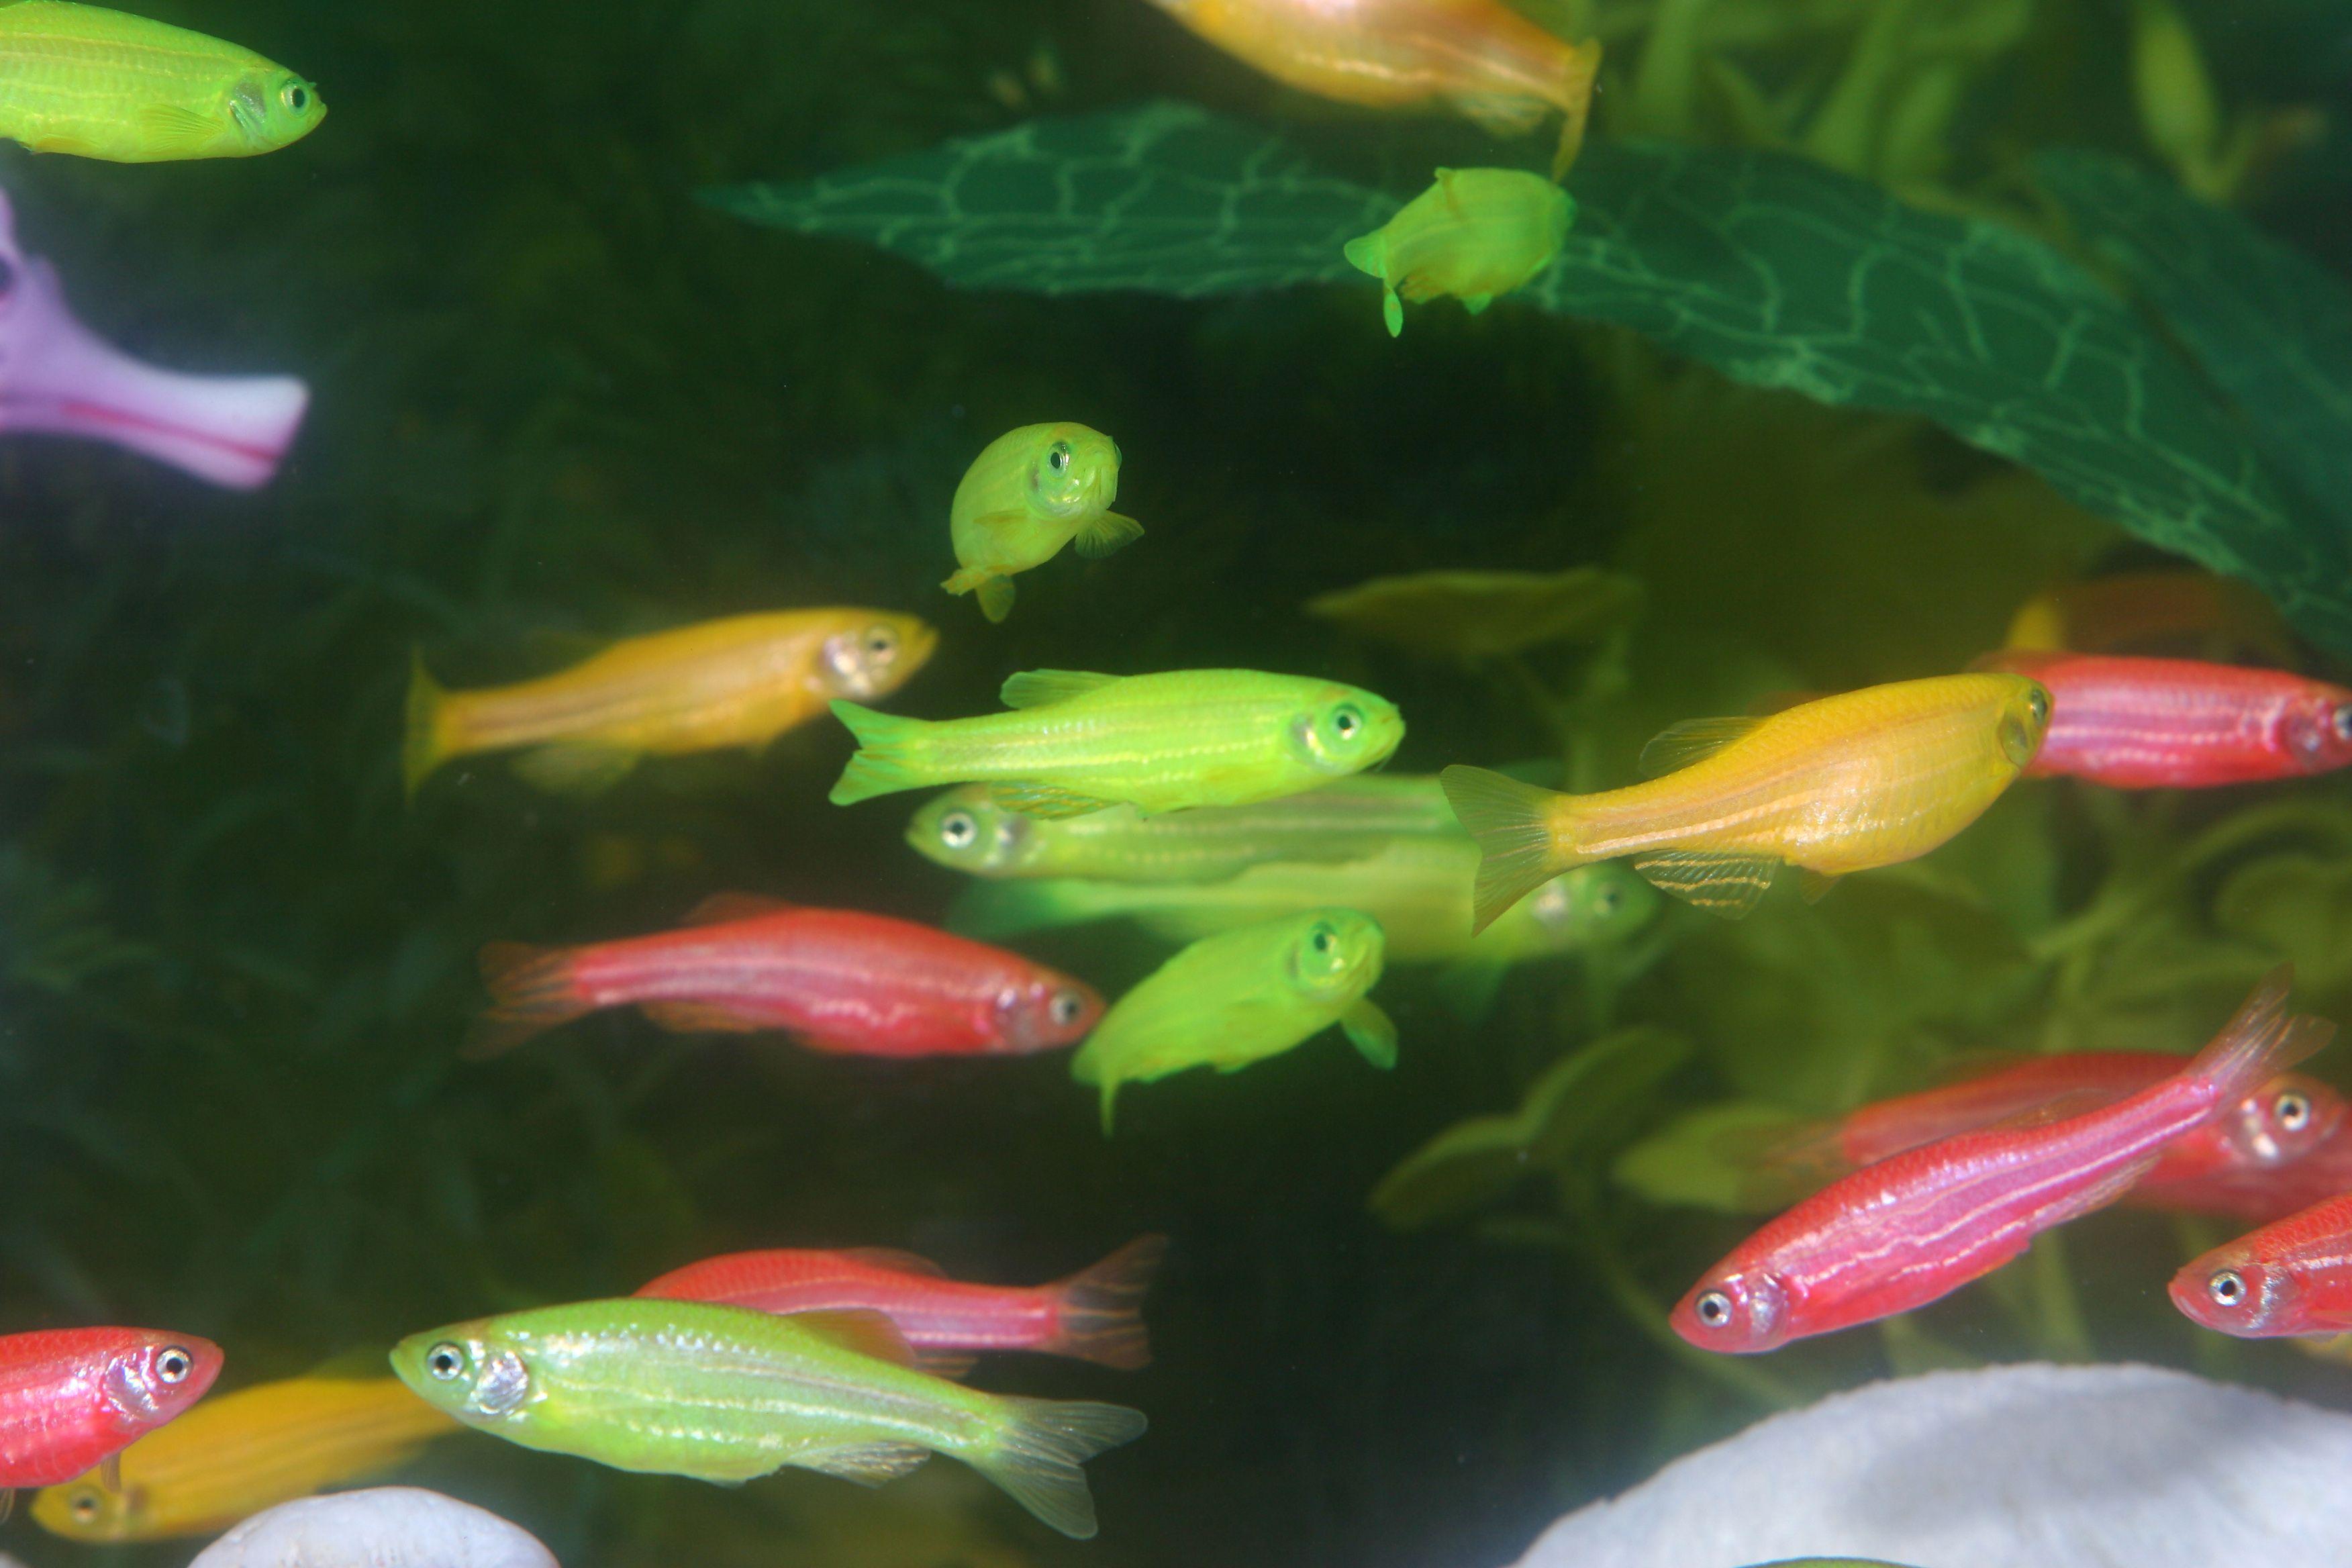 I want glow in the dark fish. :)